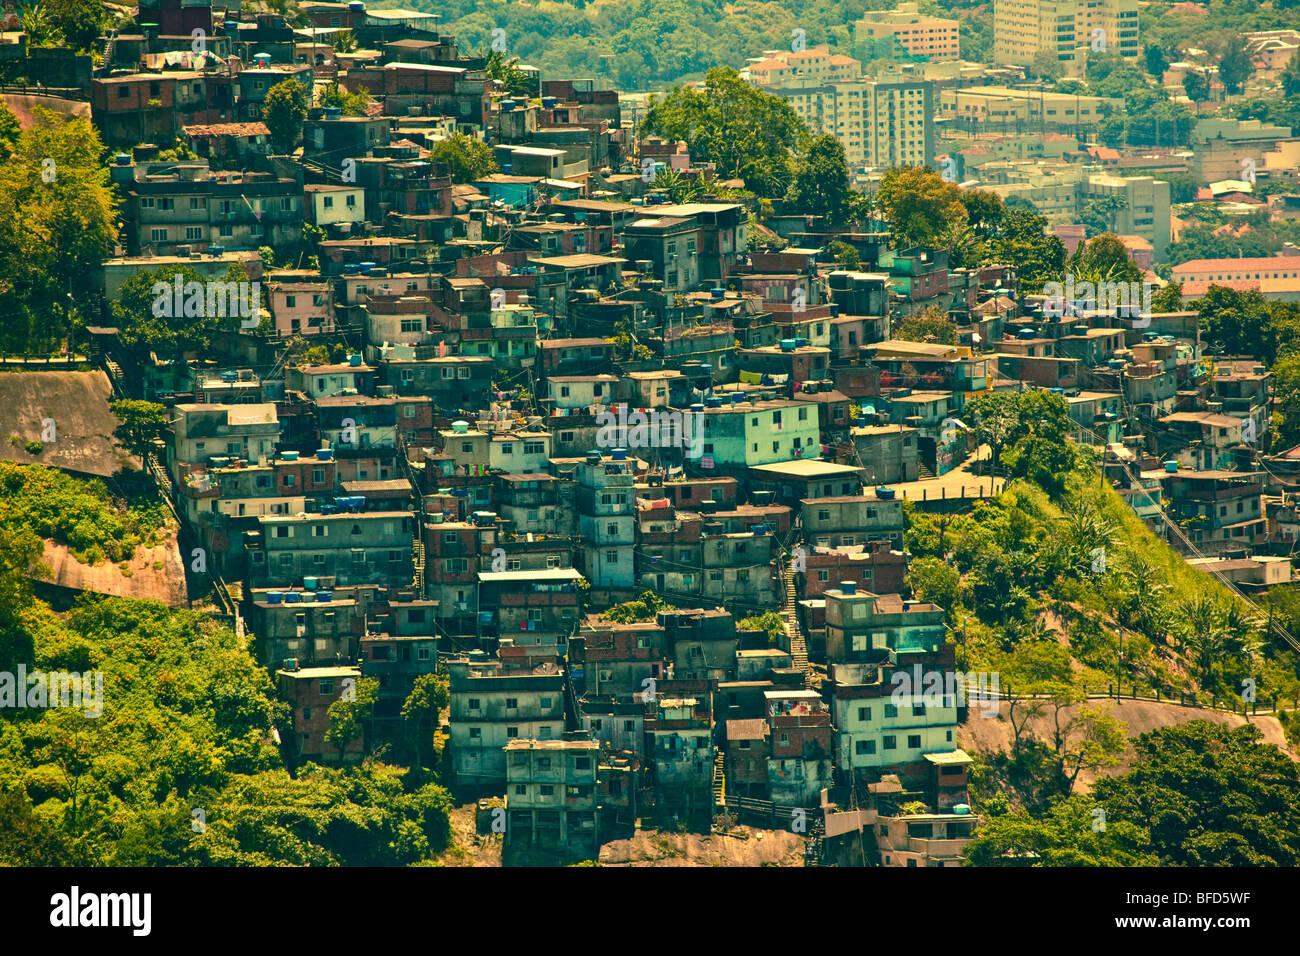 Favela or slum seen from Corcovado - Stock Image